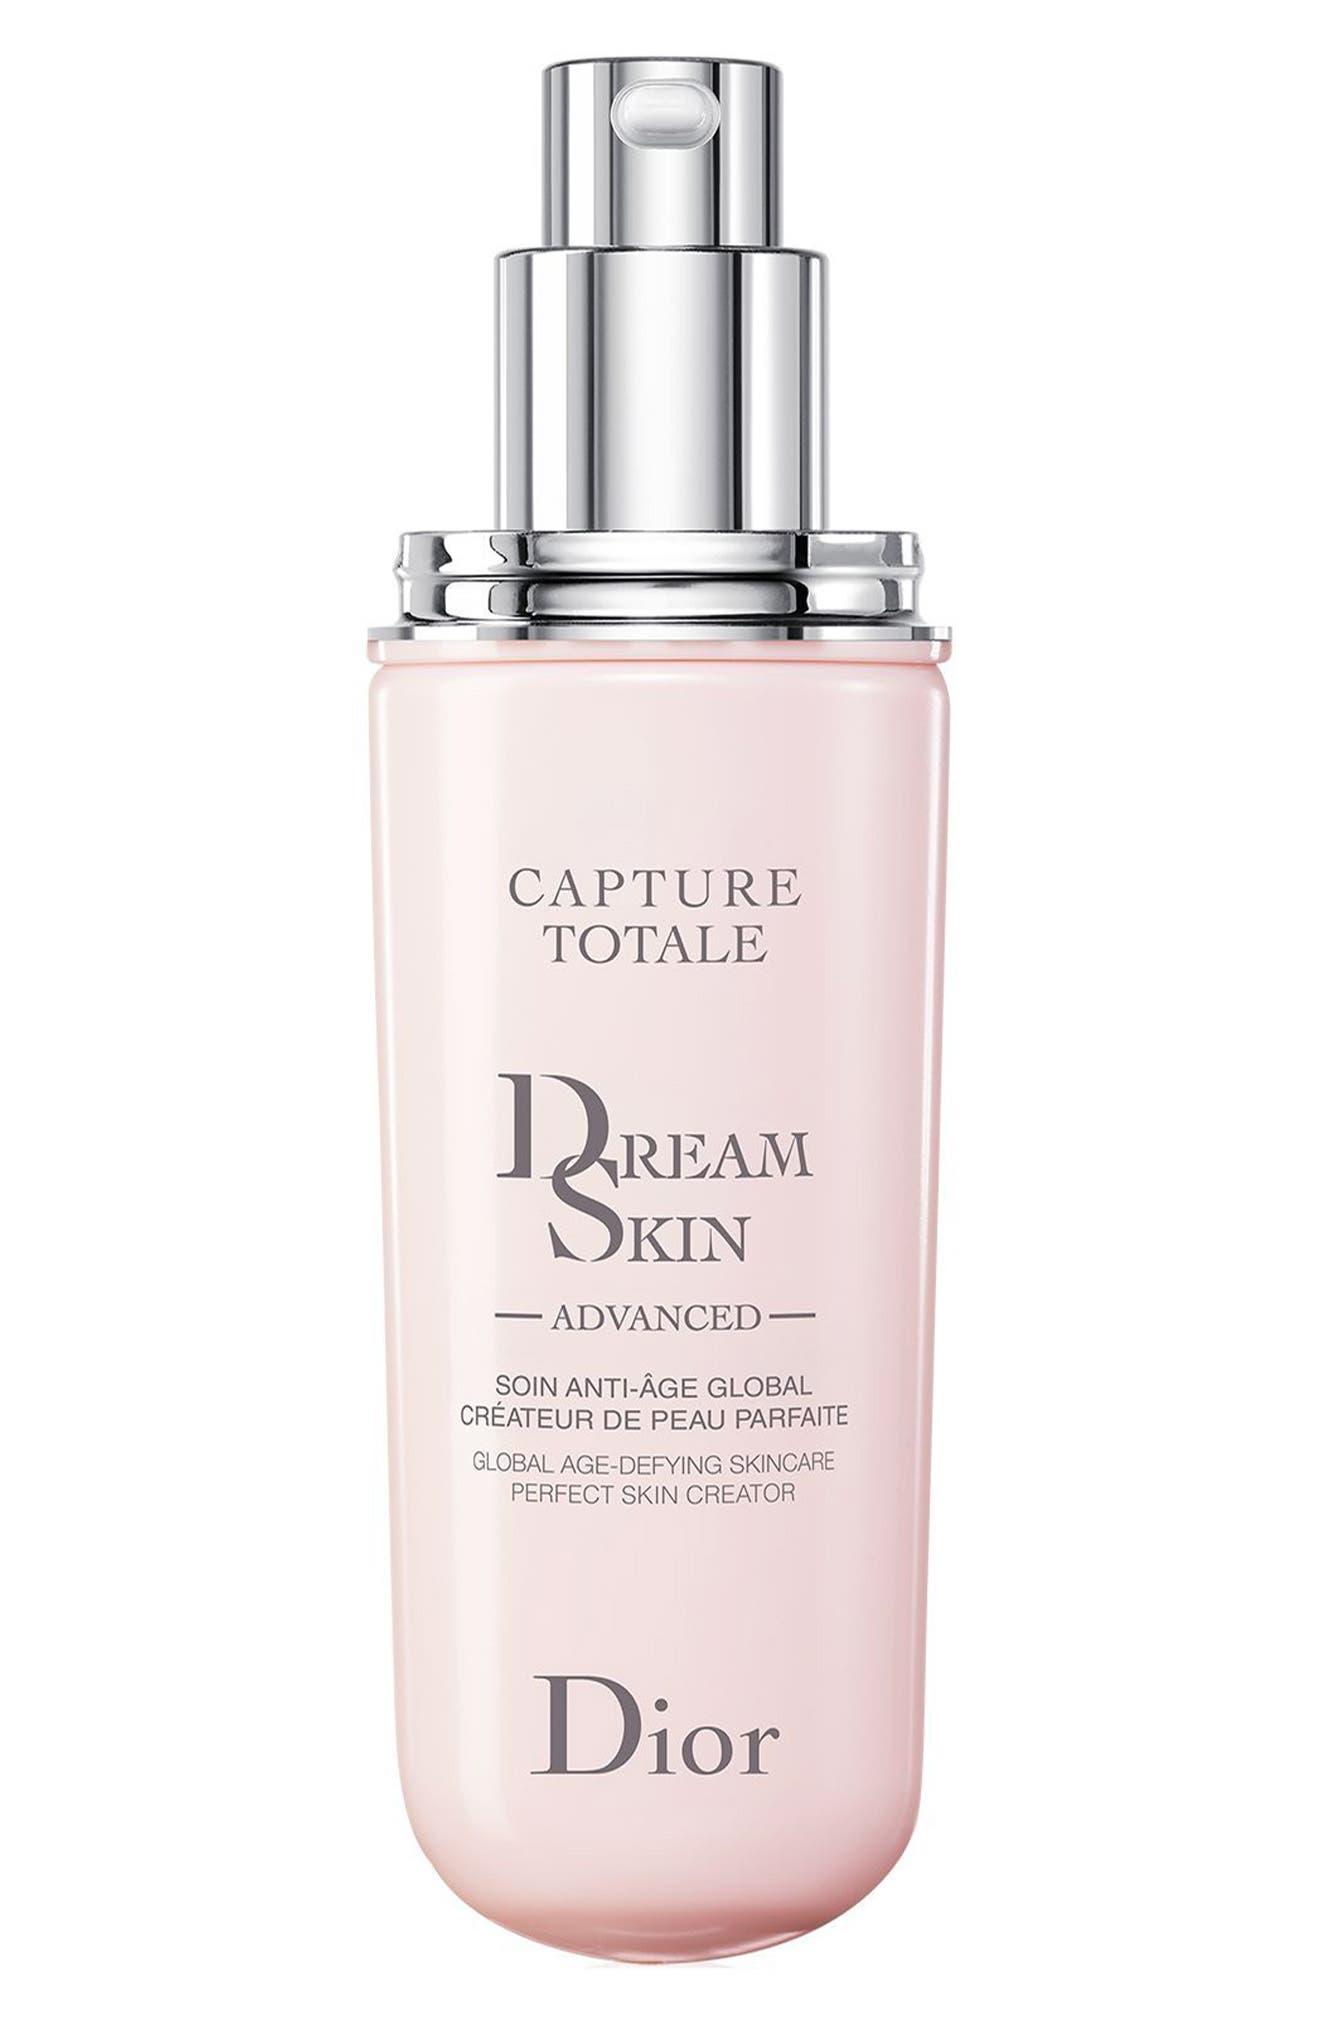 Capture Totale DreamSkin Advanced Perfect Skin Creator Refill,                             Main thumbnail 1, color,                             NO COLOR